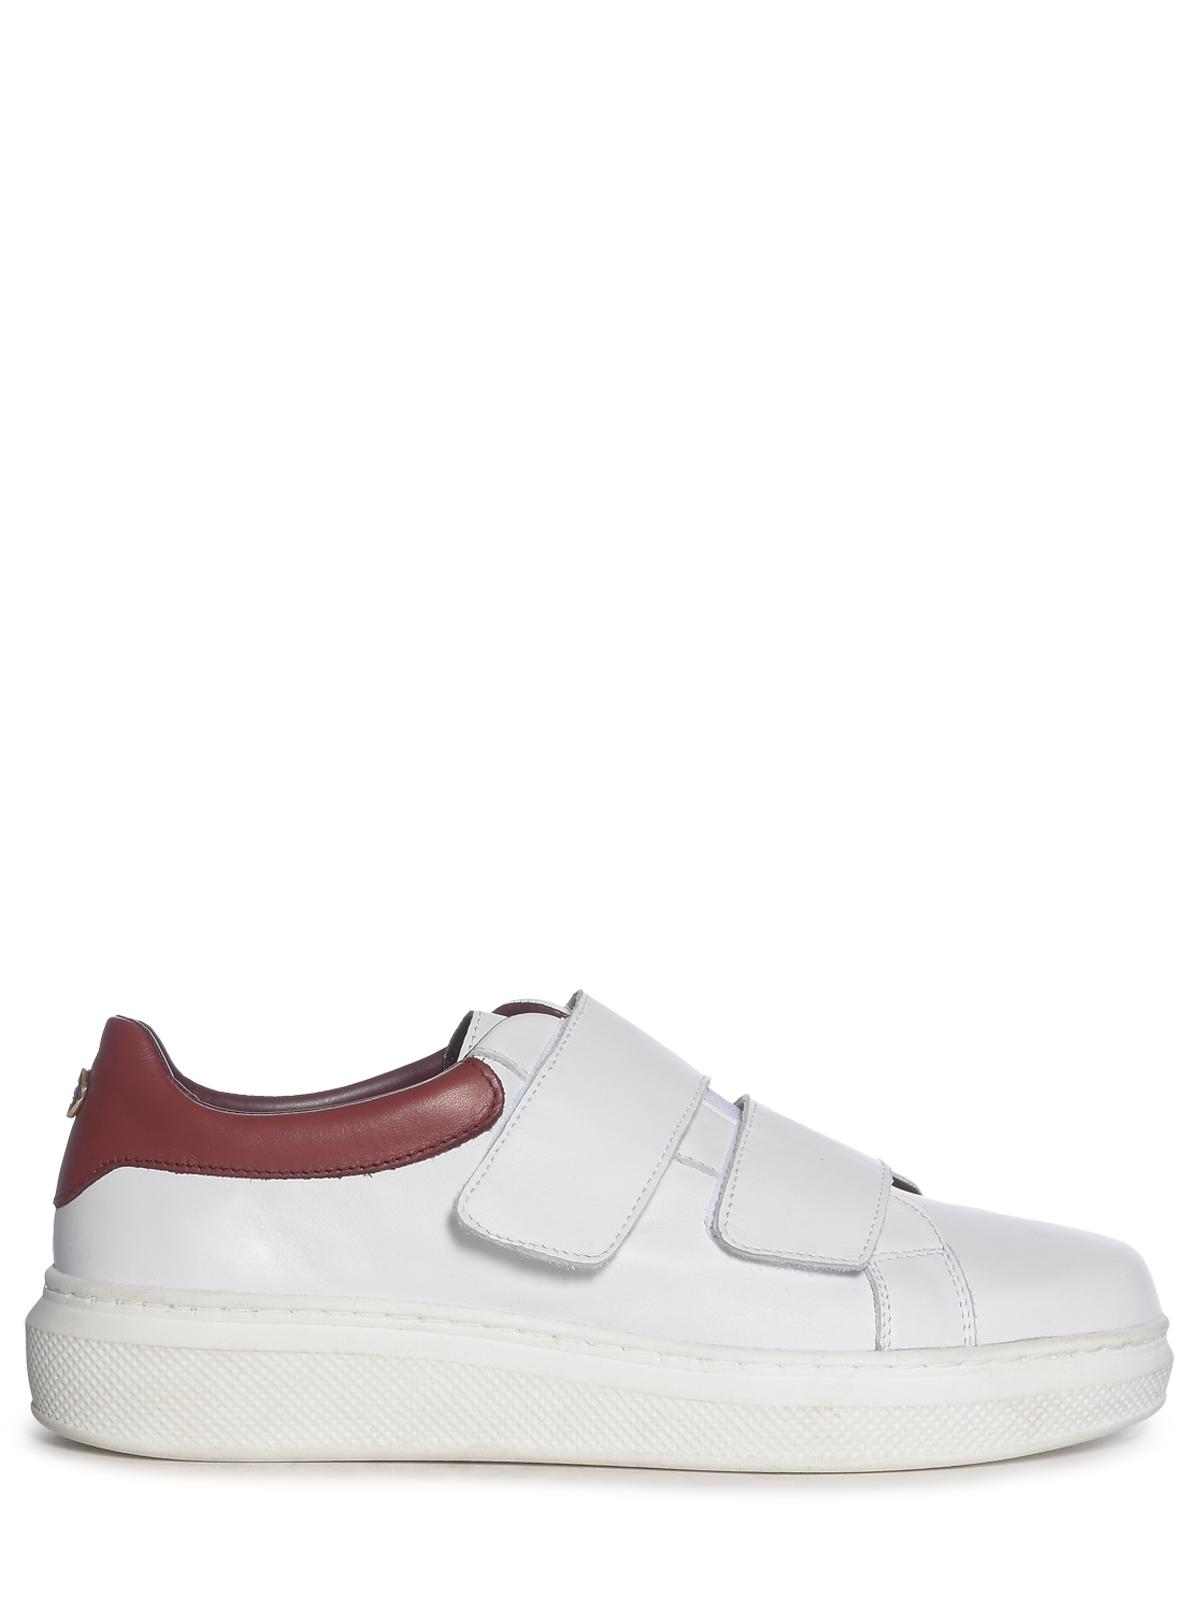 Tommy Hilfiger Sneaker Sabrina 4A1 weiß